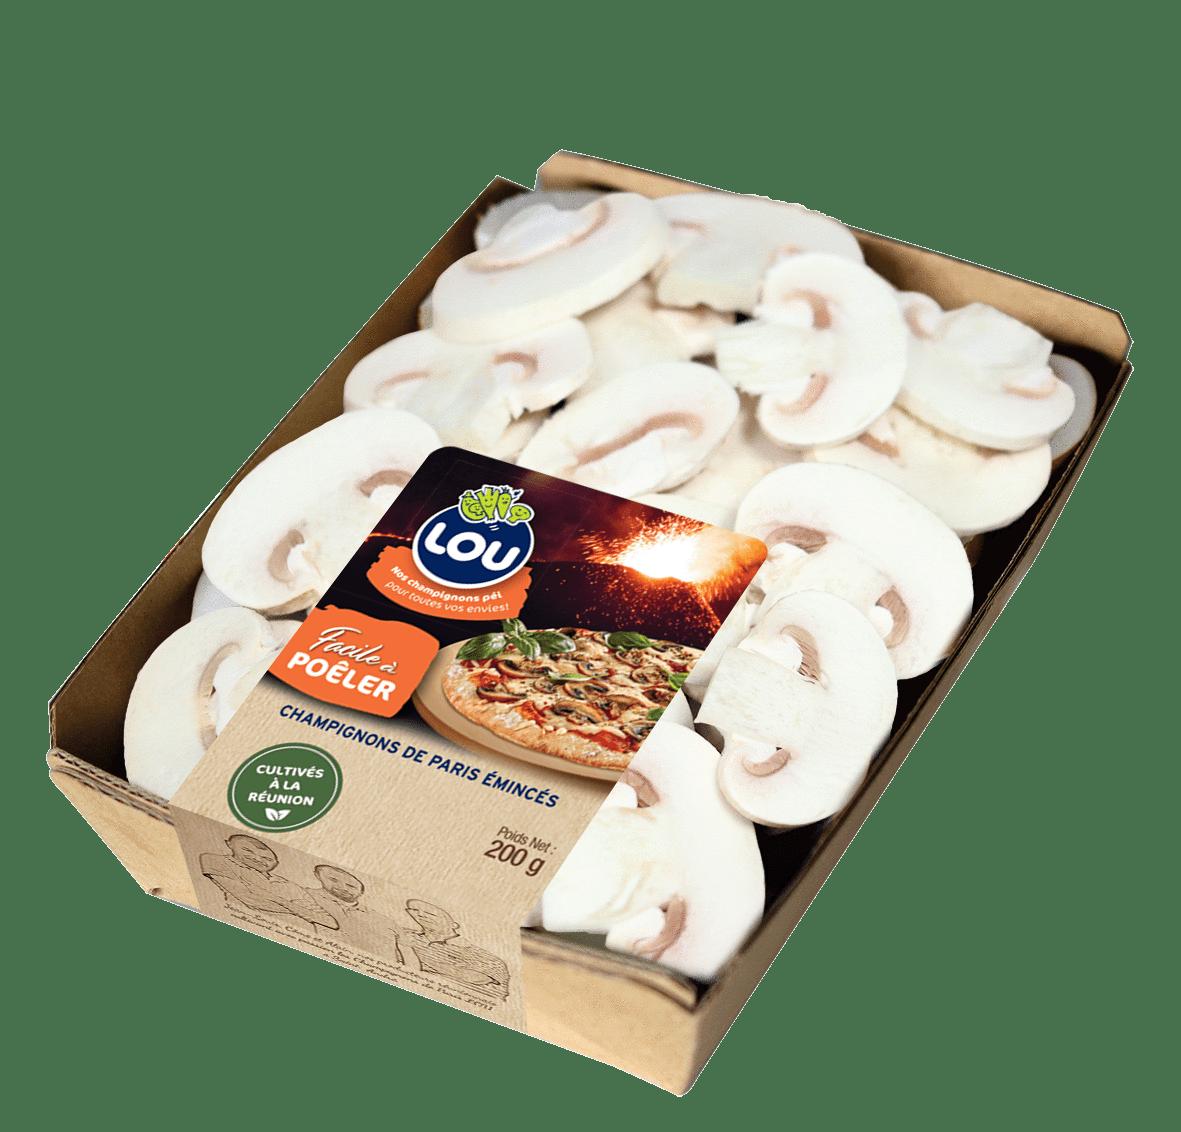 lou_champignons_974_pack3